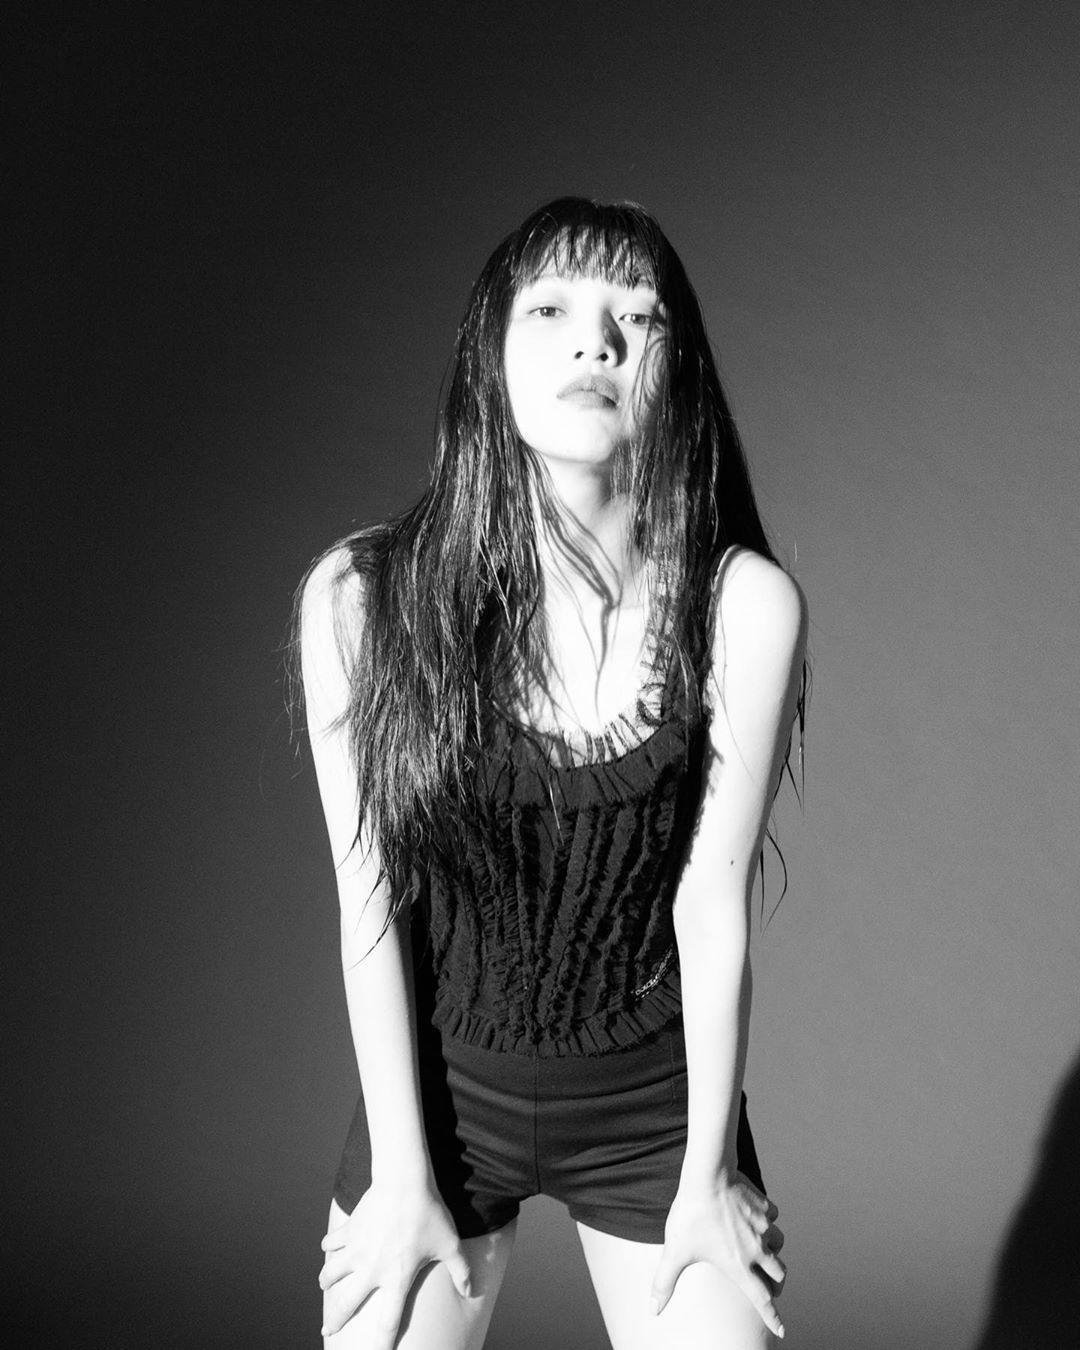 [Red Velvet][分享]191024 极致诱惑!Joy分享美照五连拍